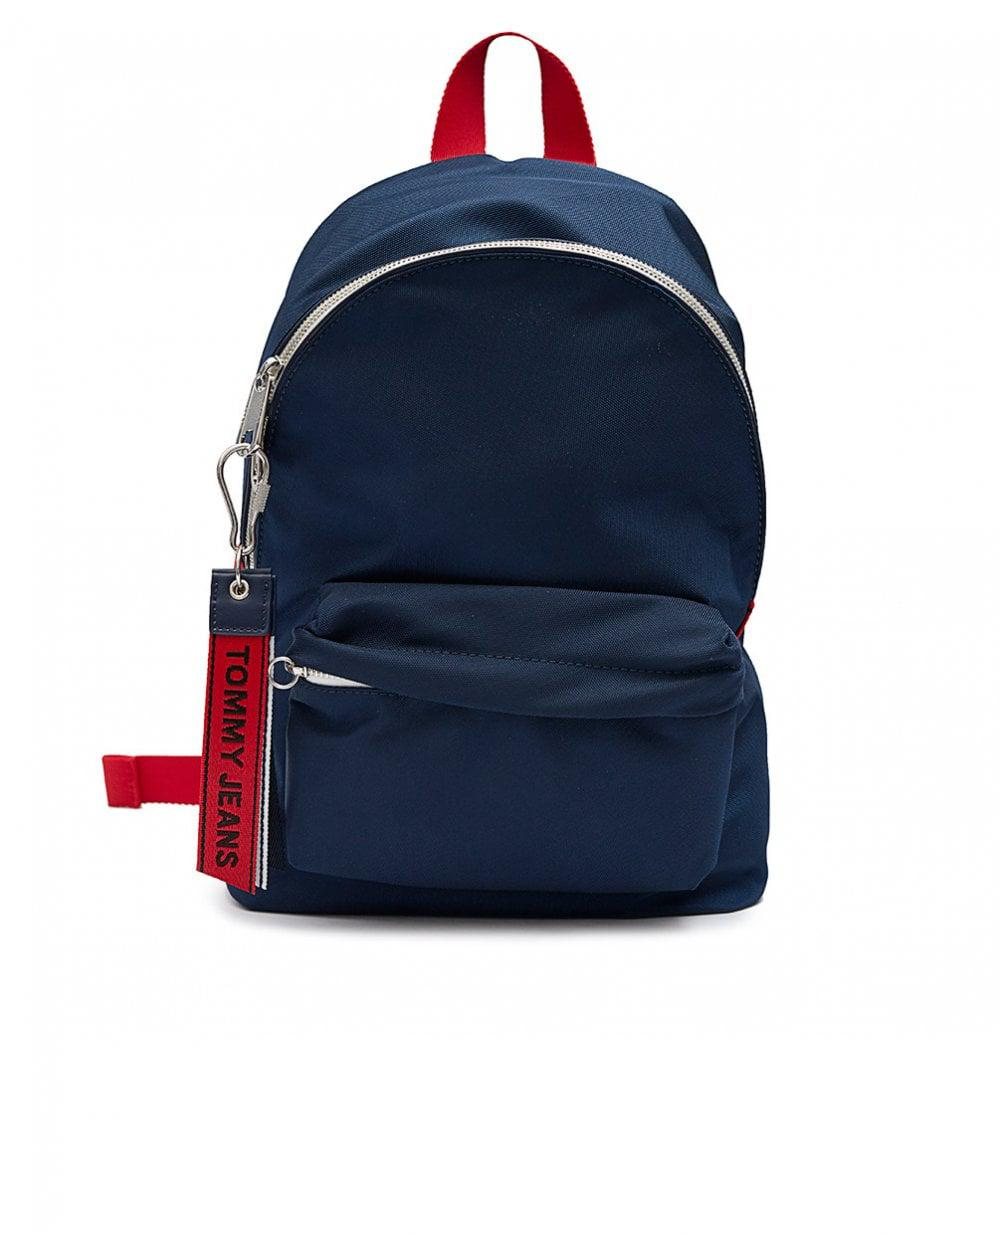 420a4256247 Tommy Hilfiger Tj Logo Tape Mini Backpack in Blue - Lyst